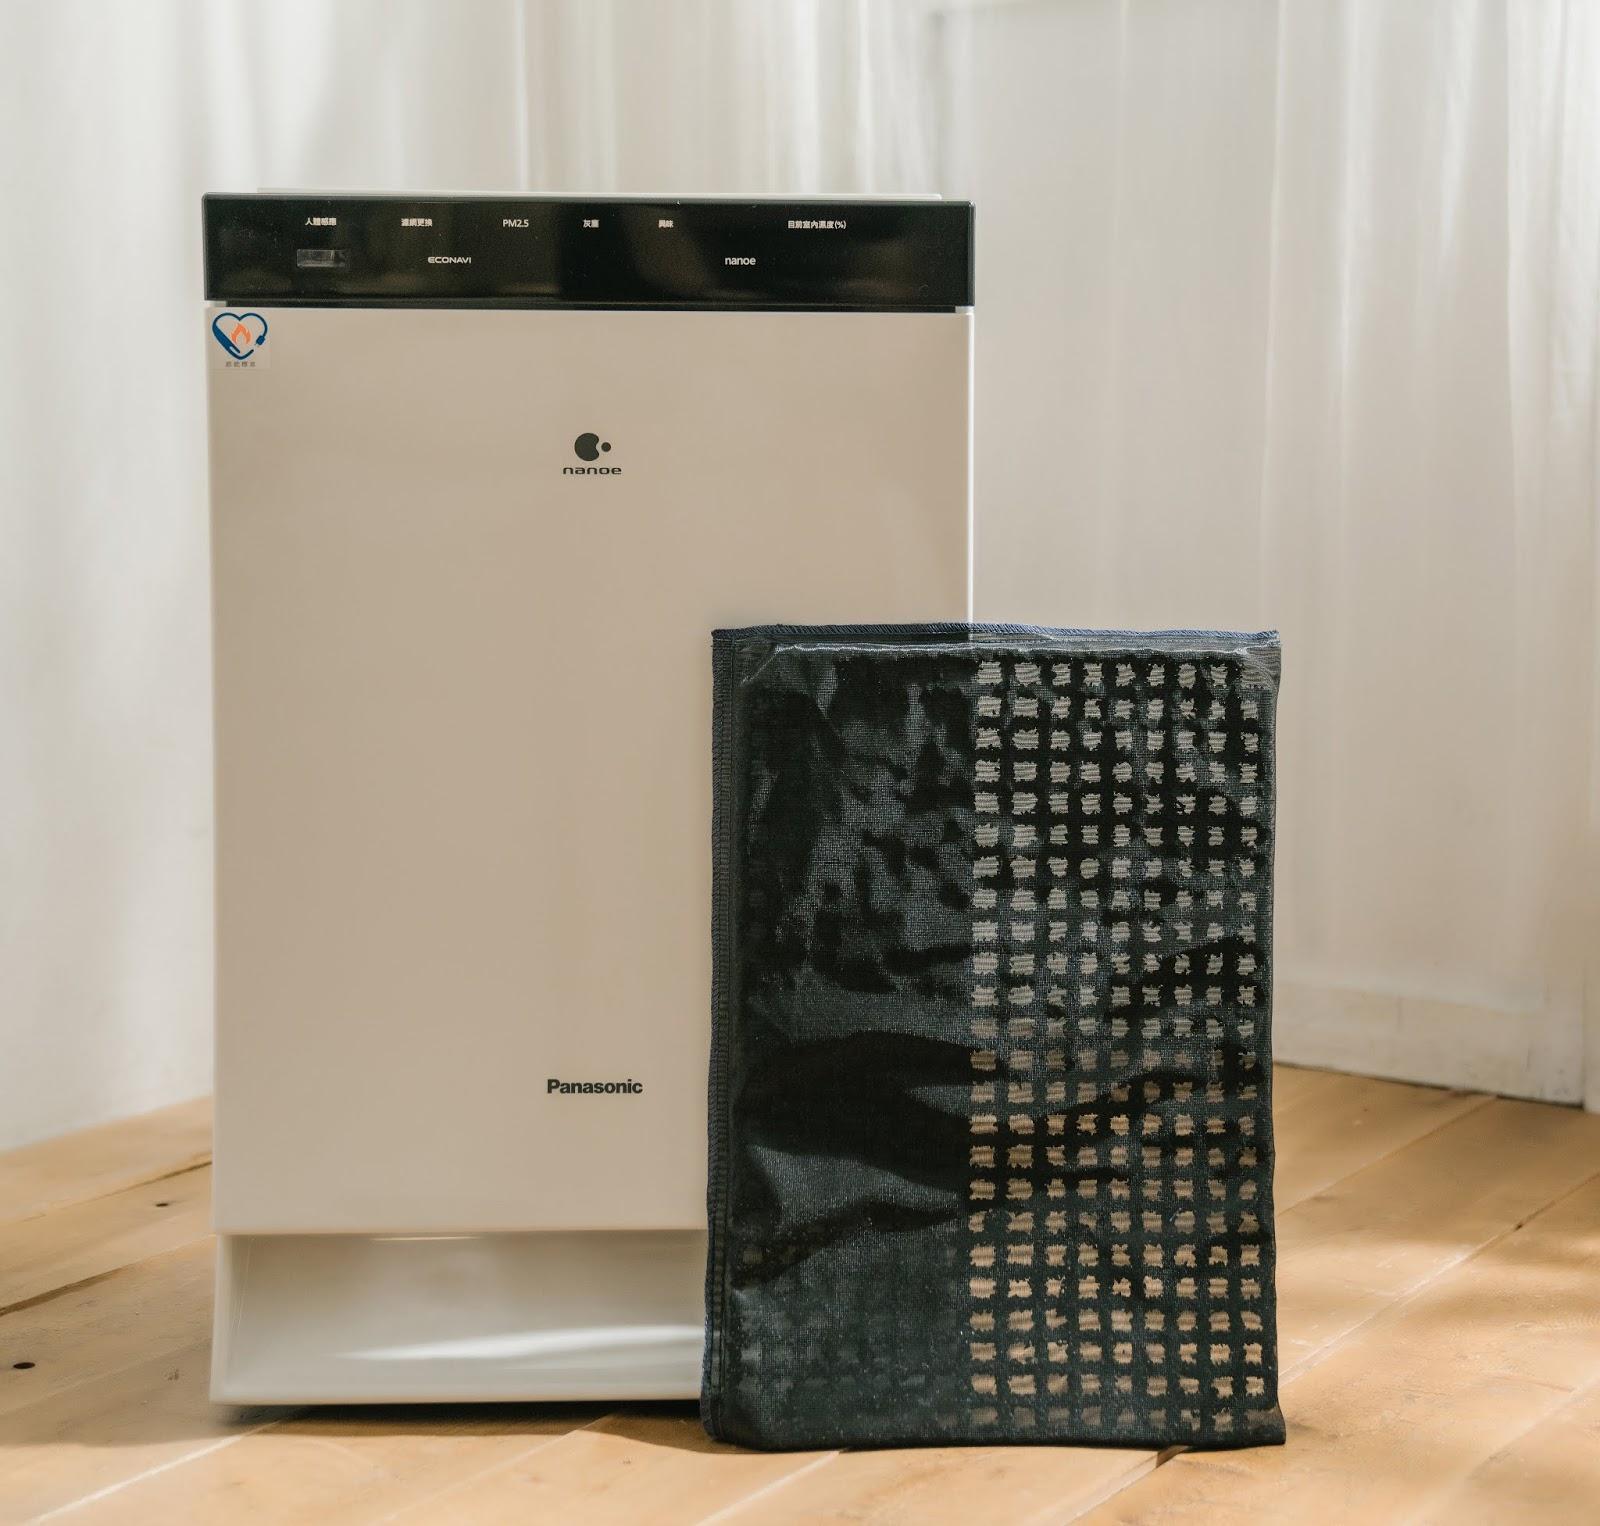 7.Panasonic_dj%25E7%2590%25A6%25E7%2590%25A6_wwwhostkikicom_%25E6%25BF%25BE%25E7%25B6%25B2.jpg-雙重淨化室內空氣,用空氣清淨機打擊換季過敏生病